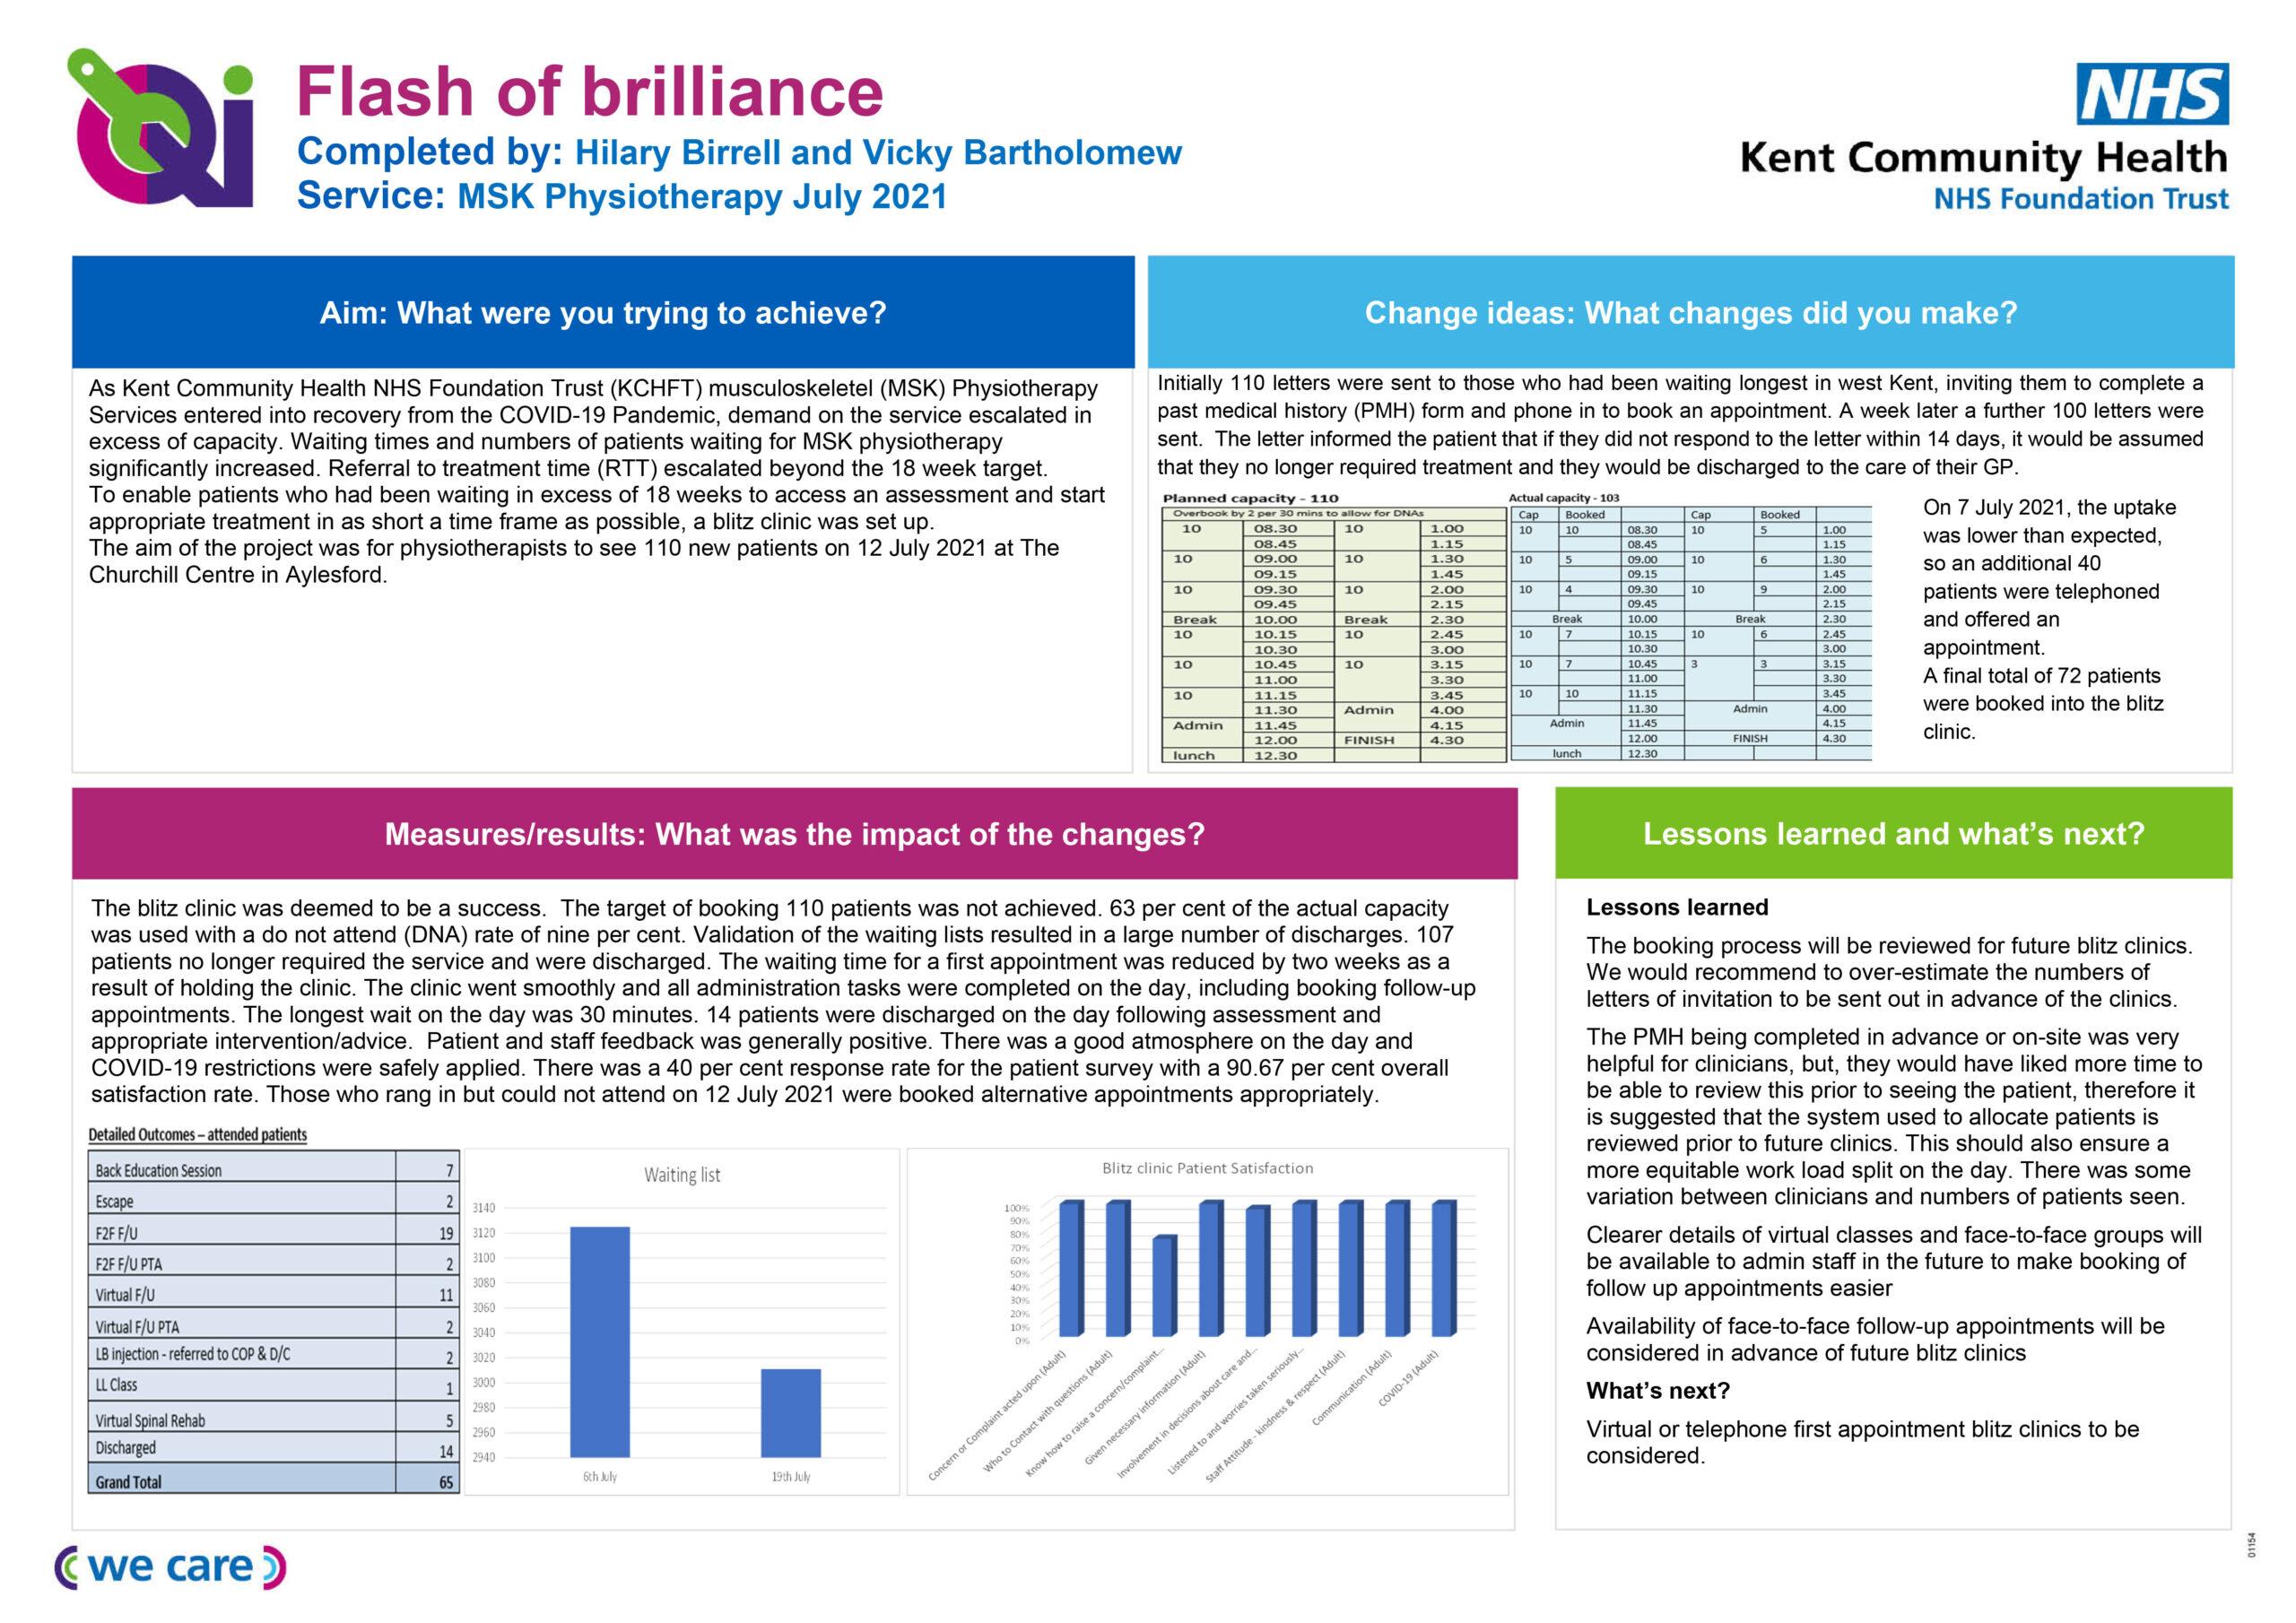 Flash of brilliance MSK blitz clinic